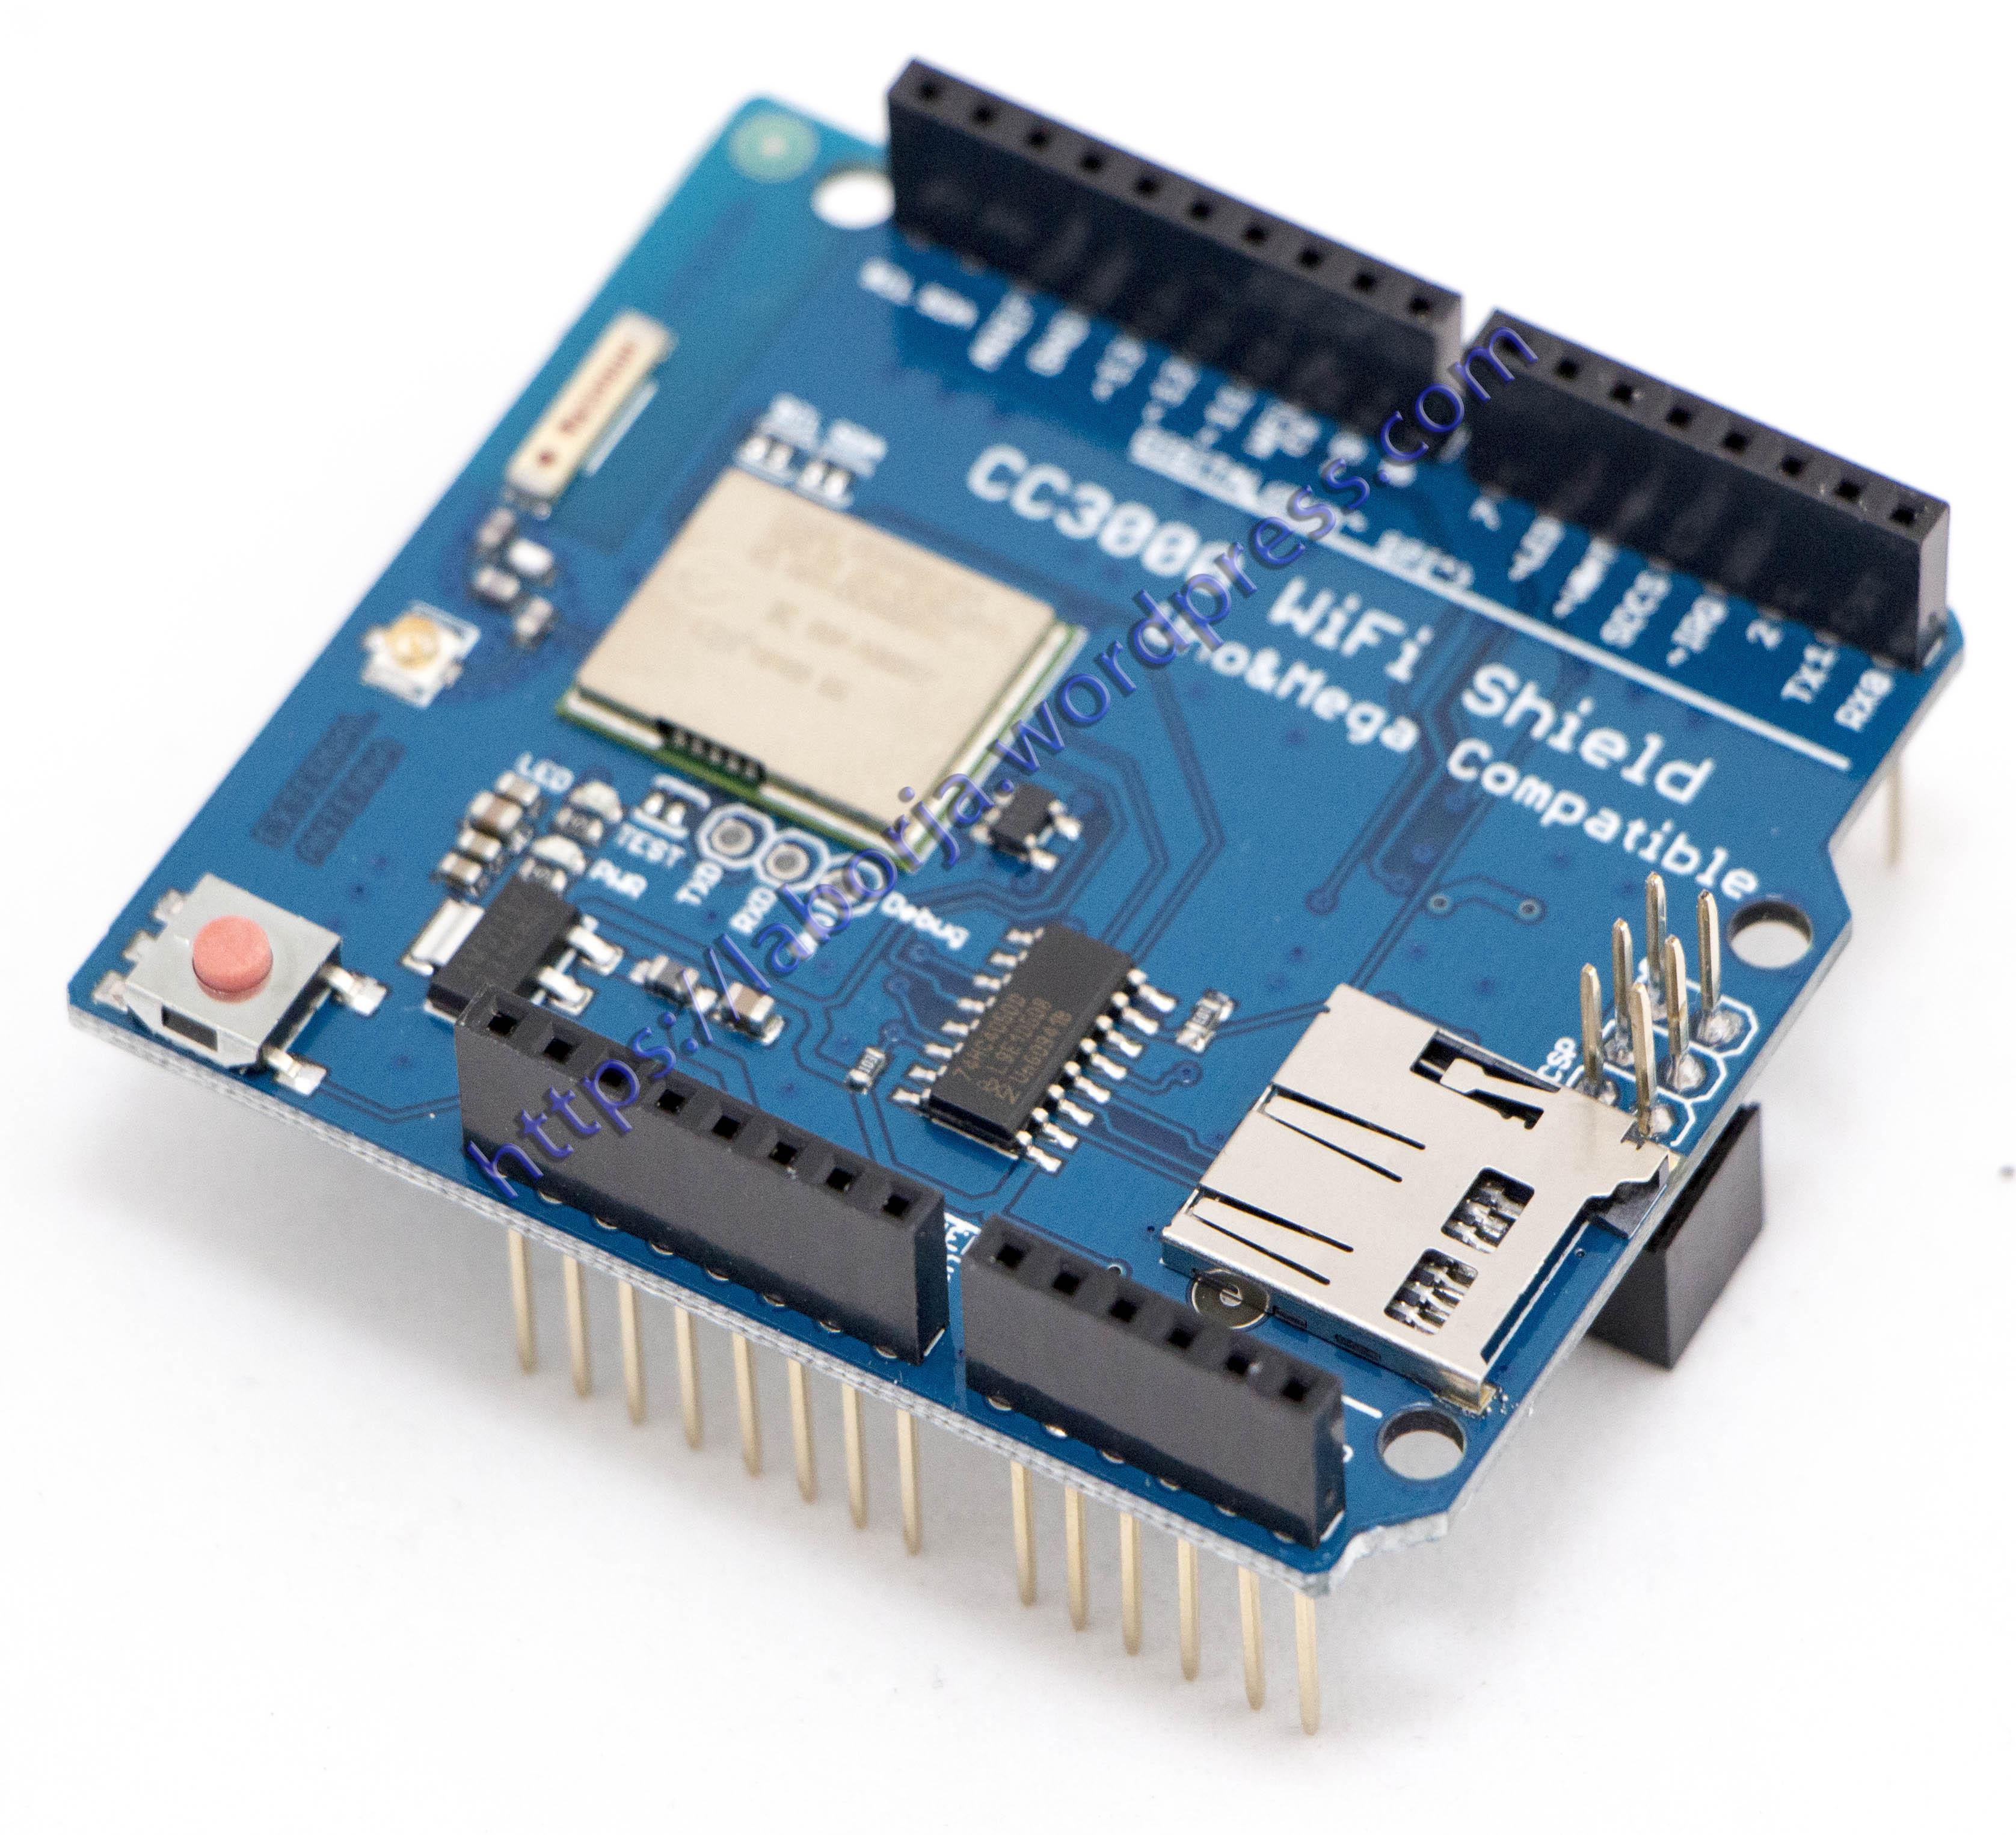 cc3000 wifi shield borja home page rh laborjag com CC3000 Arduino Wireless Charging